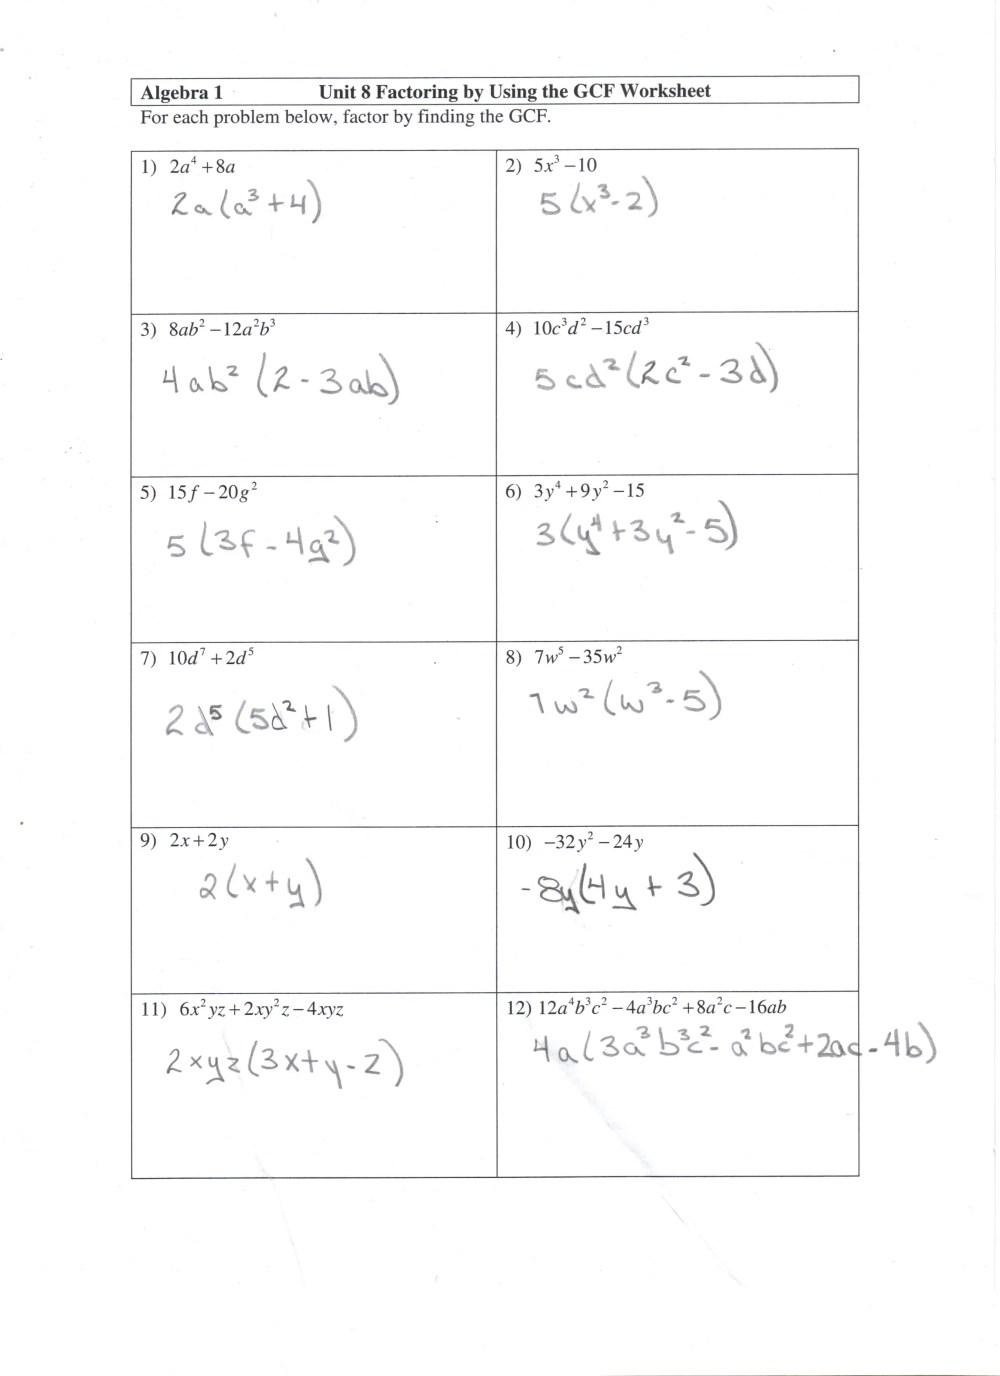 medium resolution of 27 Algebra 1 Unit 8 Factoring By Using The Gcf Worksheet - Free Worksheet  Spreadsheet